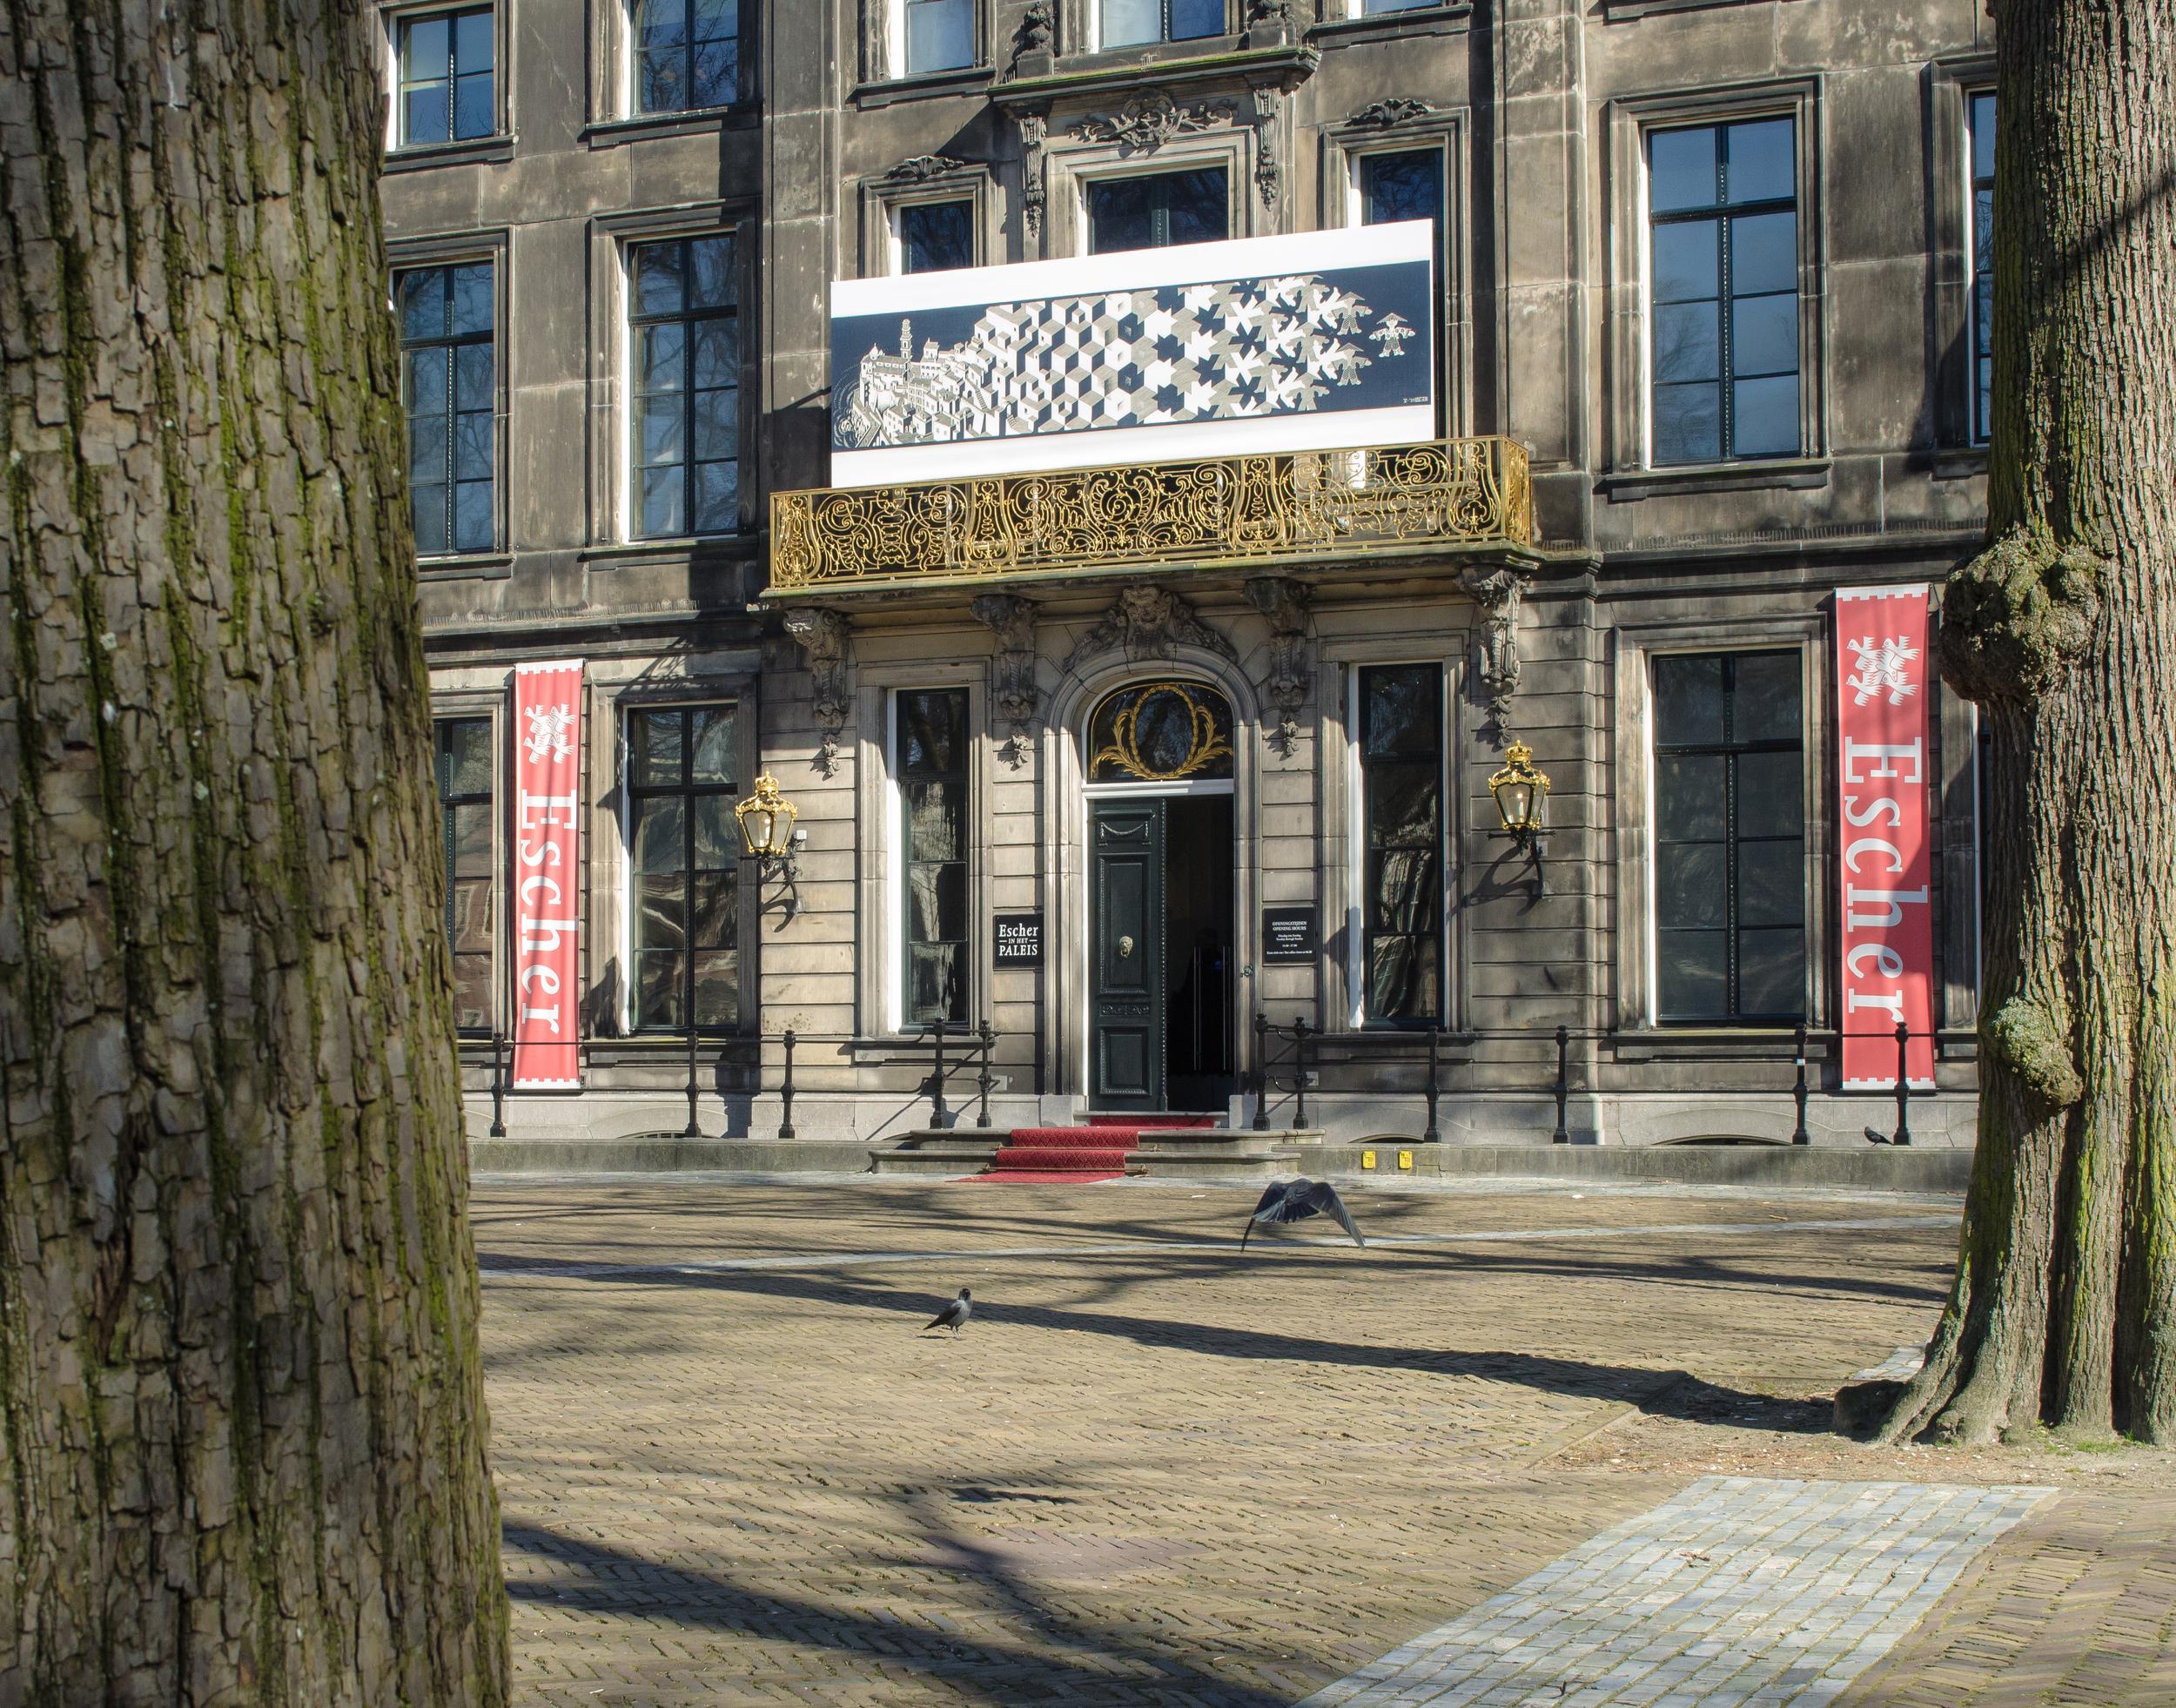 entrance the the Escher Museum